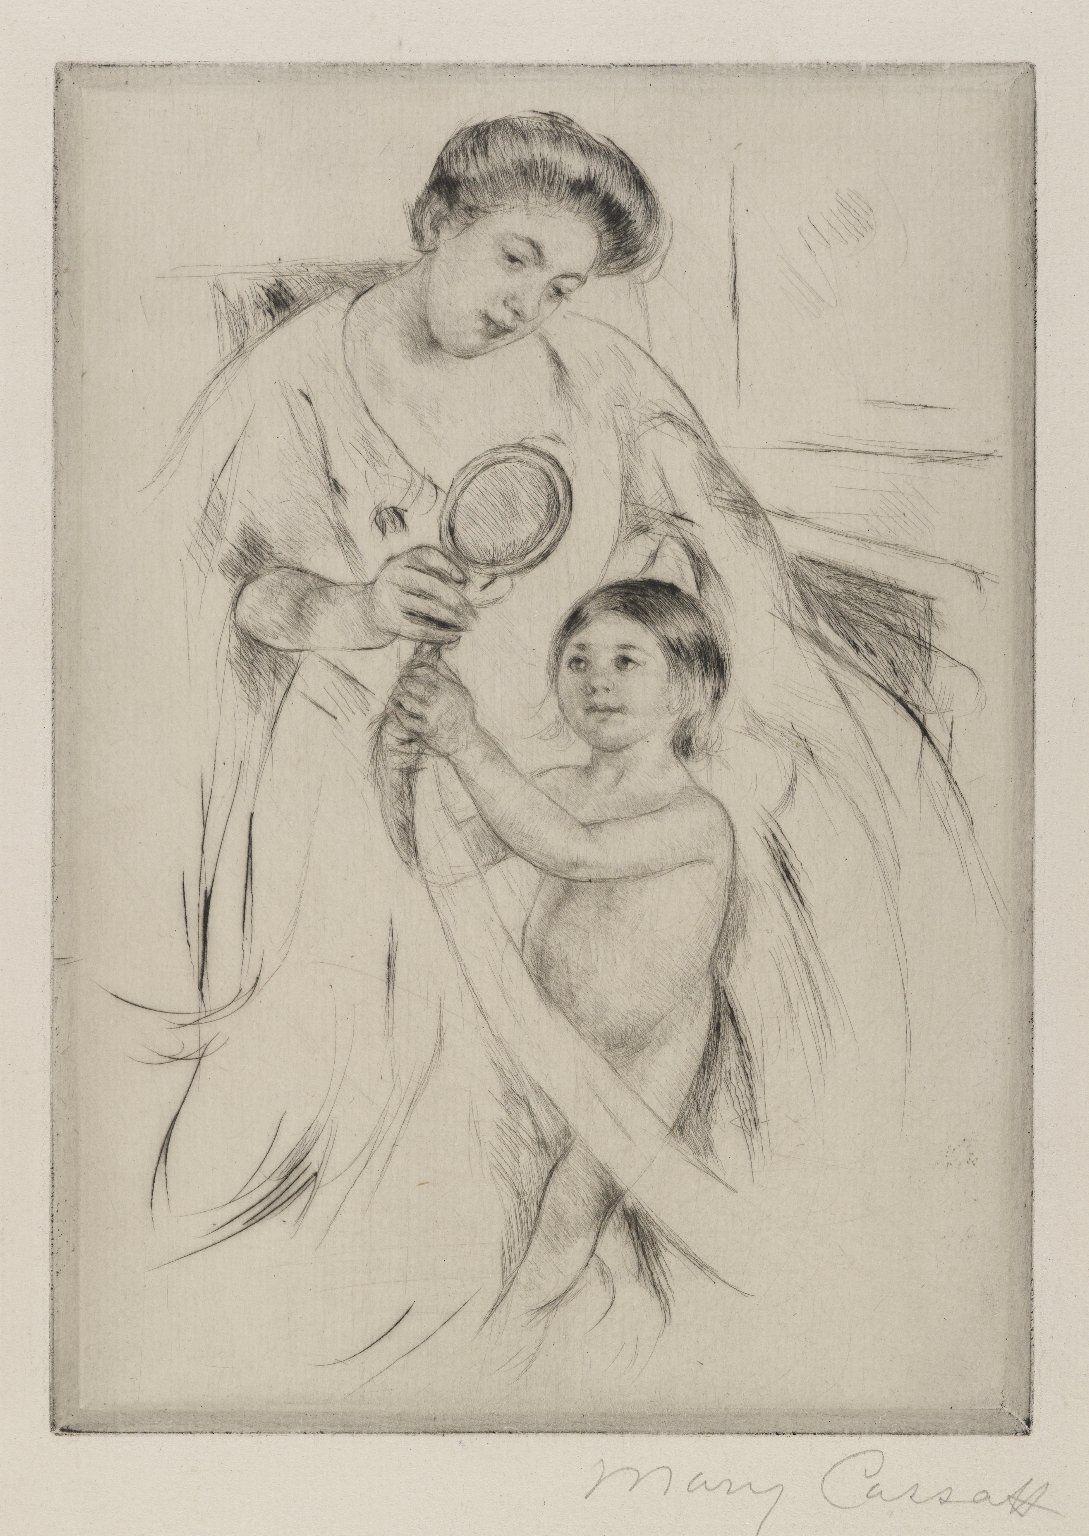 Mary Cassatt (1844-1926) - La Glace a Main - disegno - 1905 - Brooklyn Museum, New York